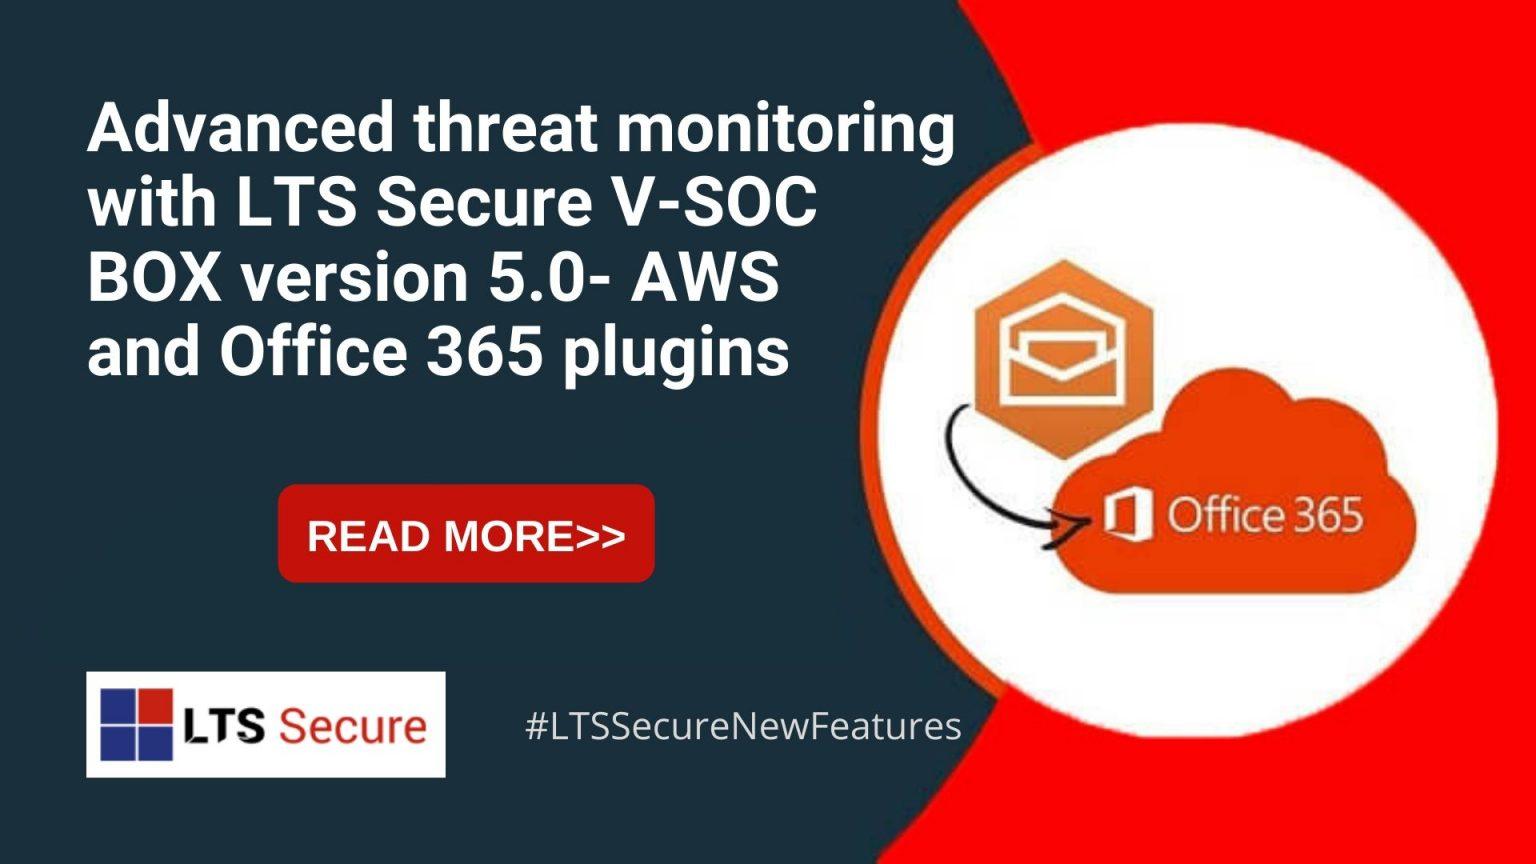 LTS Secure Blog